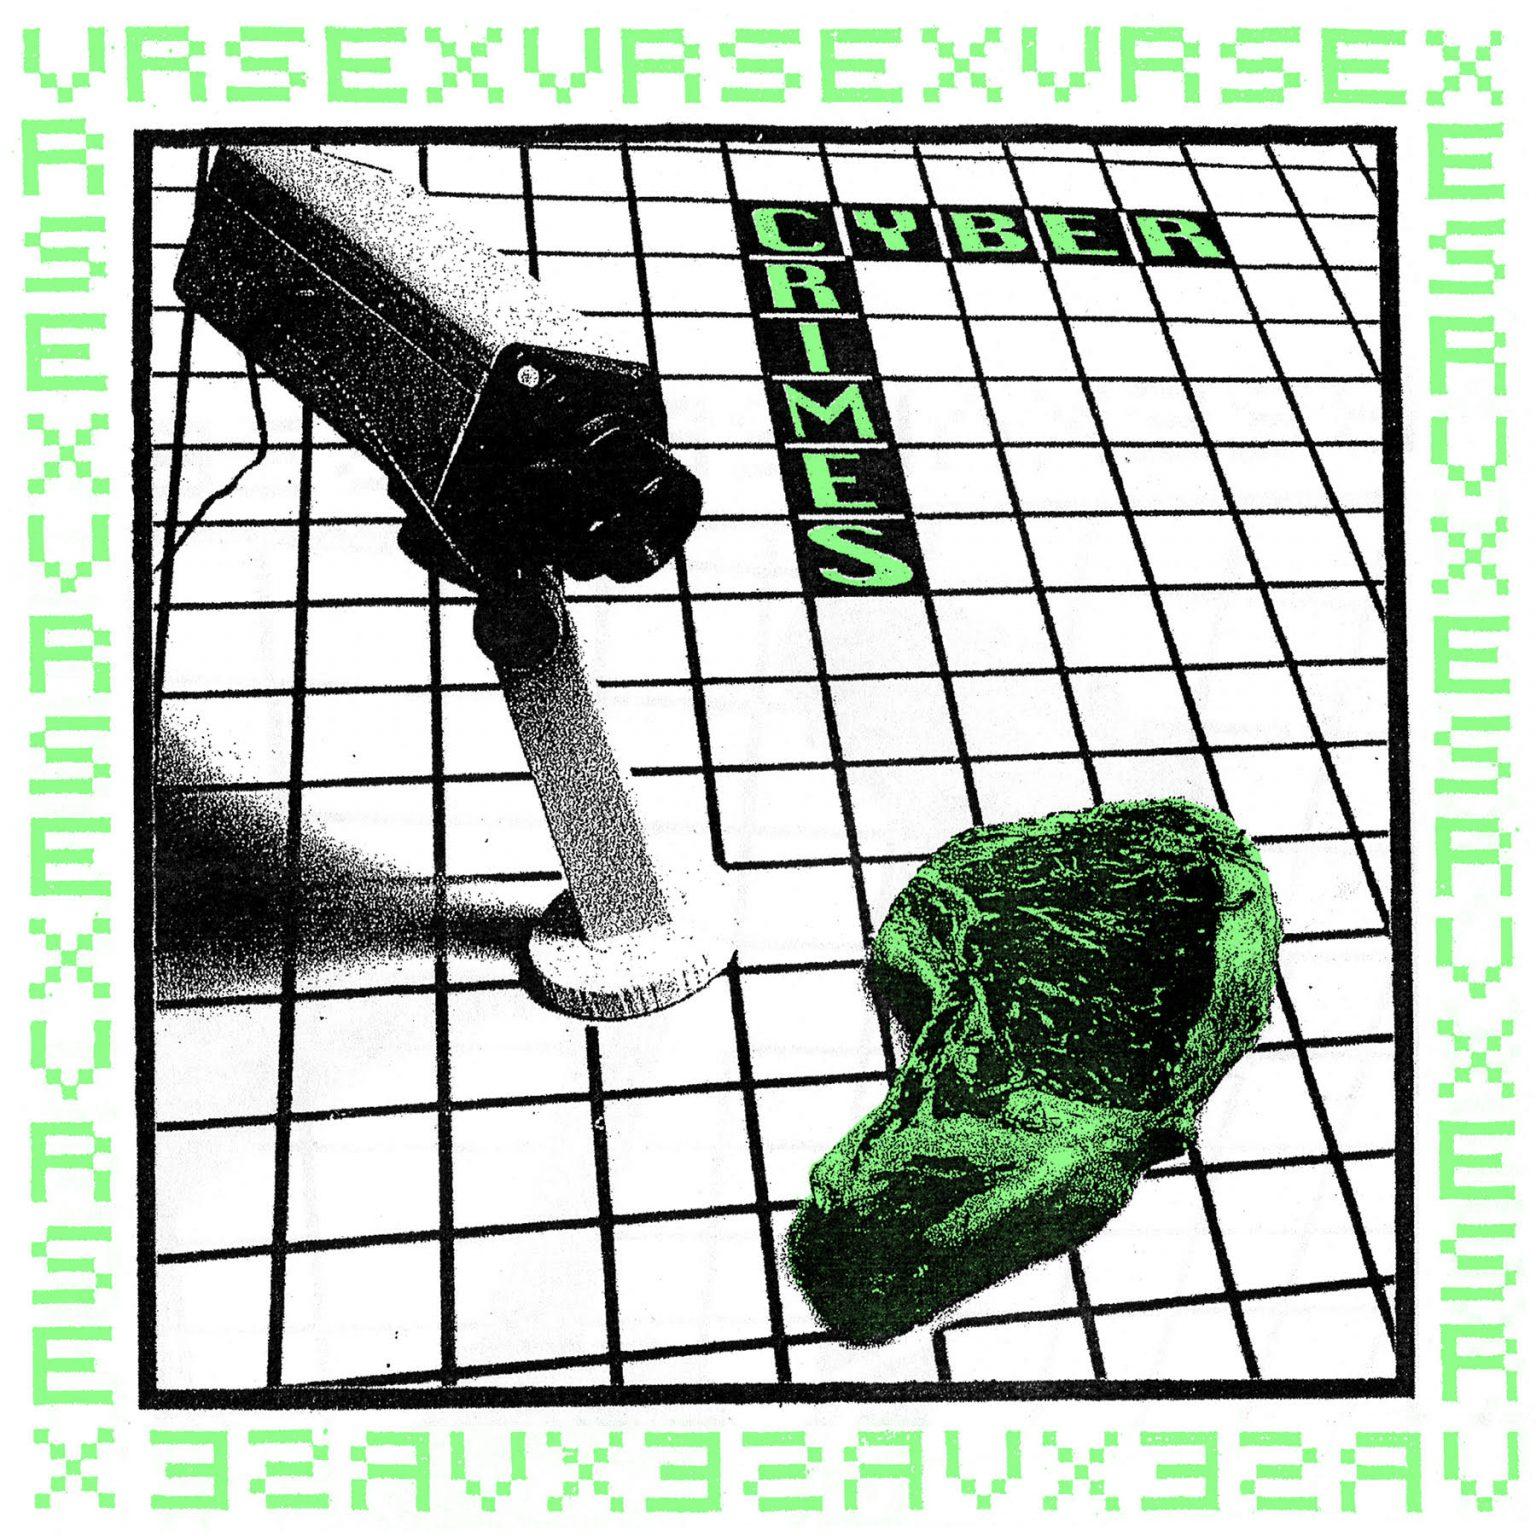 News – VR SEX – Cyber Crimes